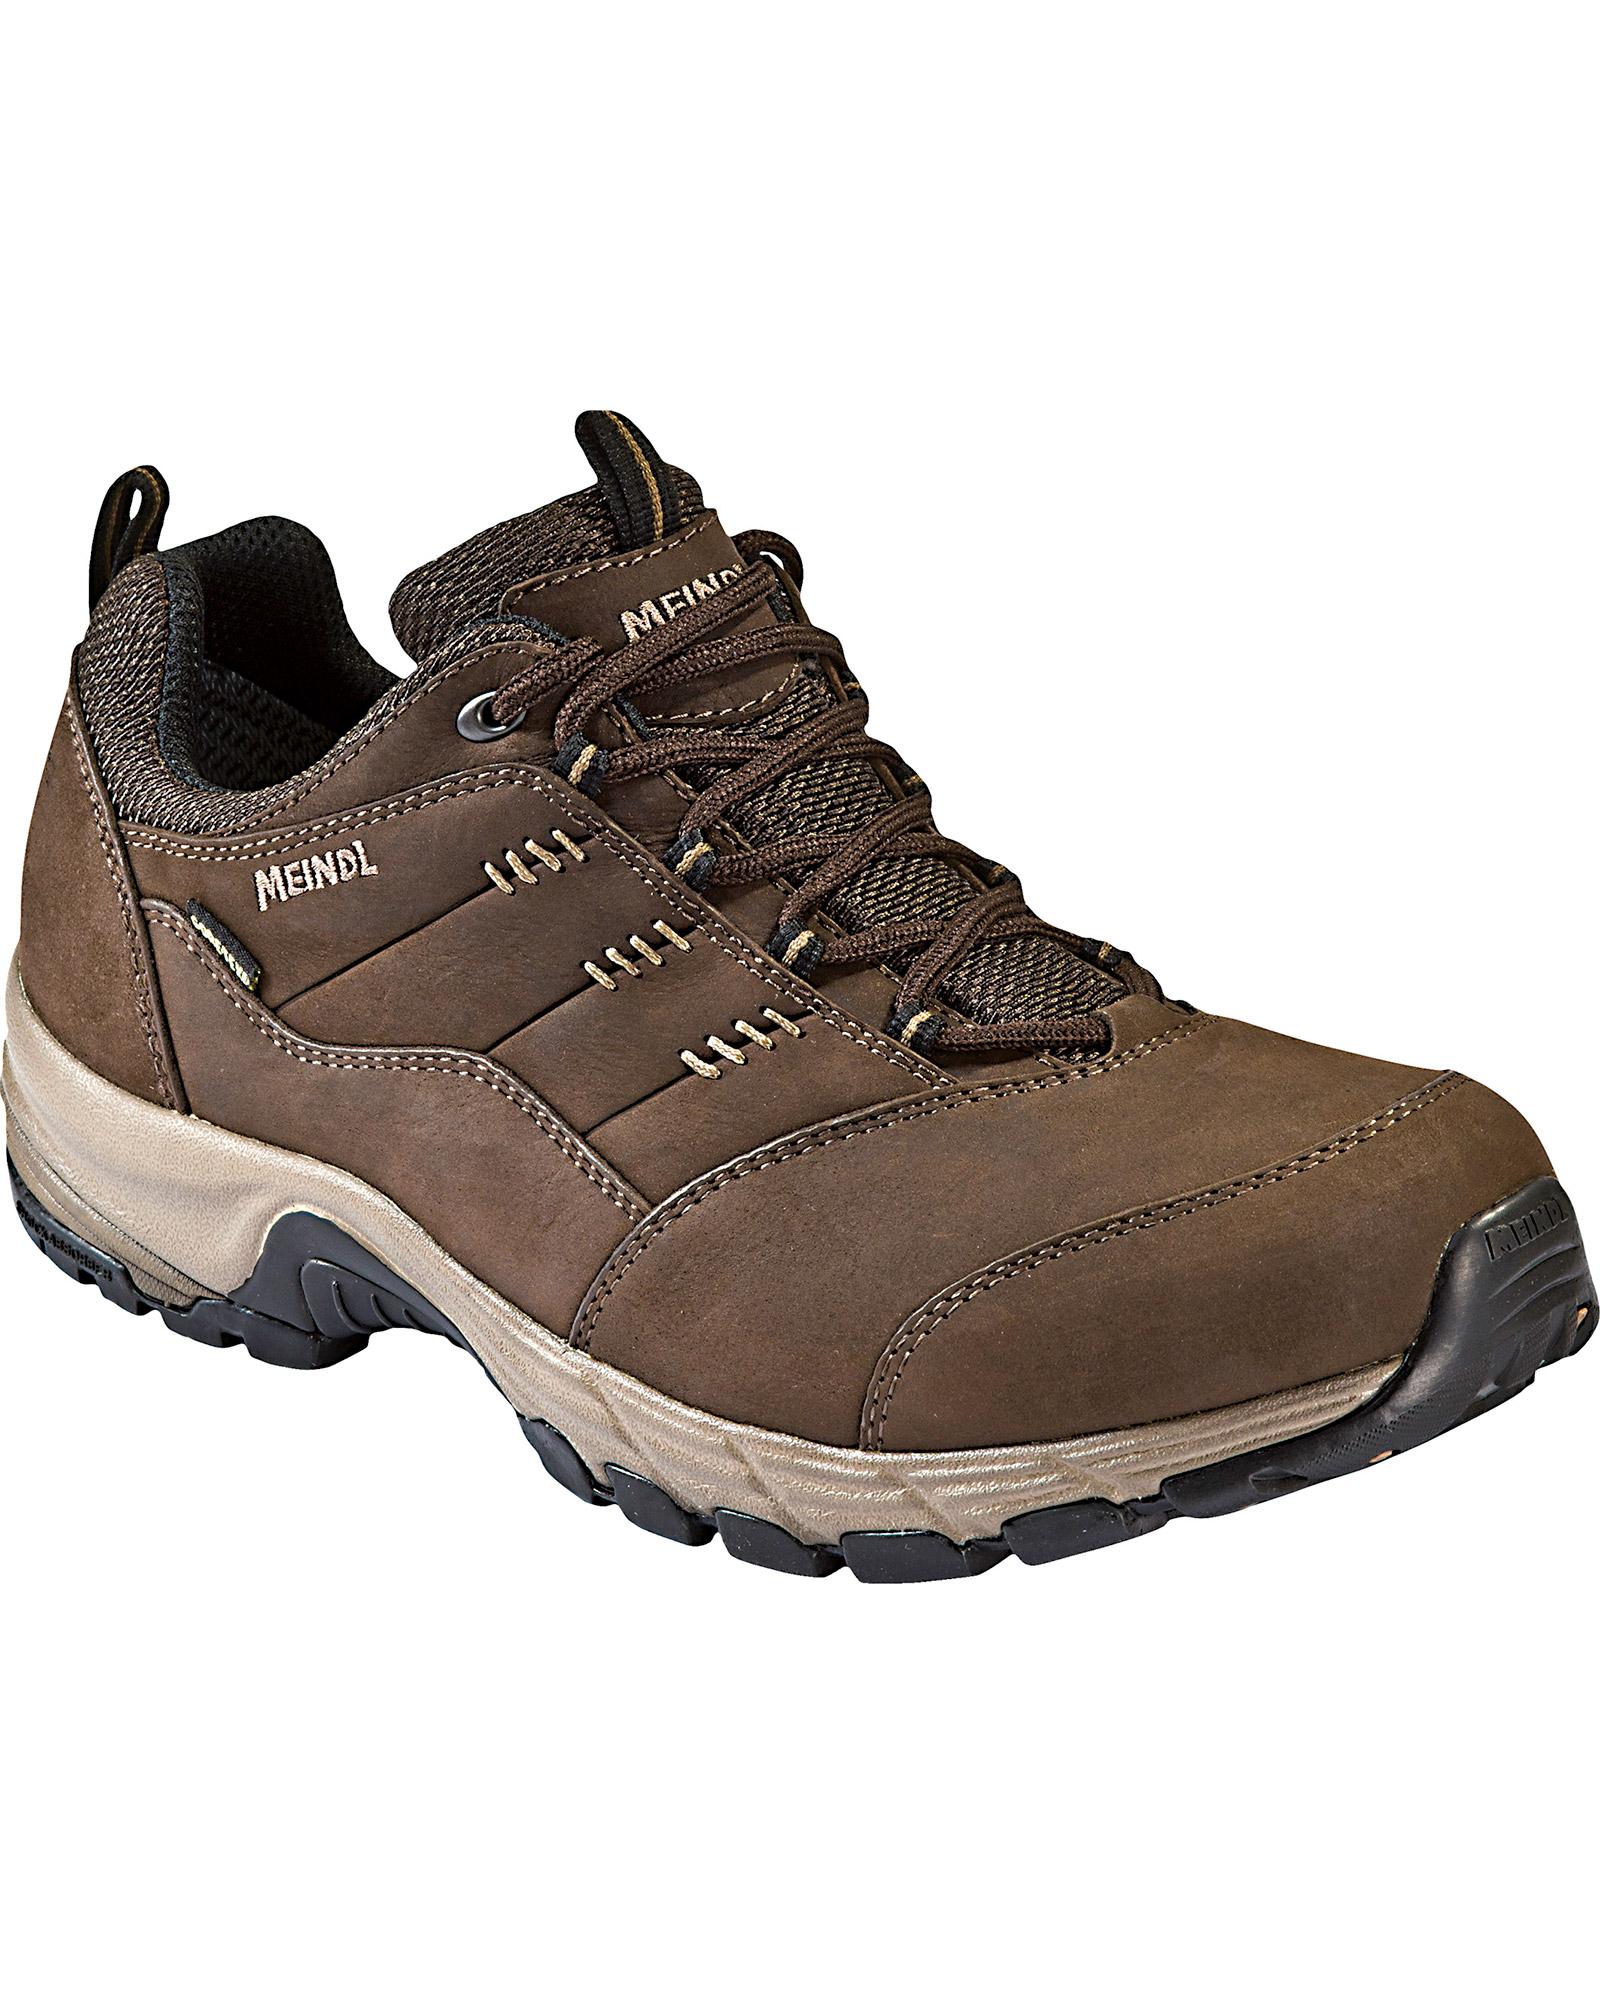 Meindl Men's Philadelphia GORE-TEX Walking Shoes 0